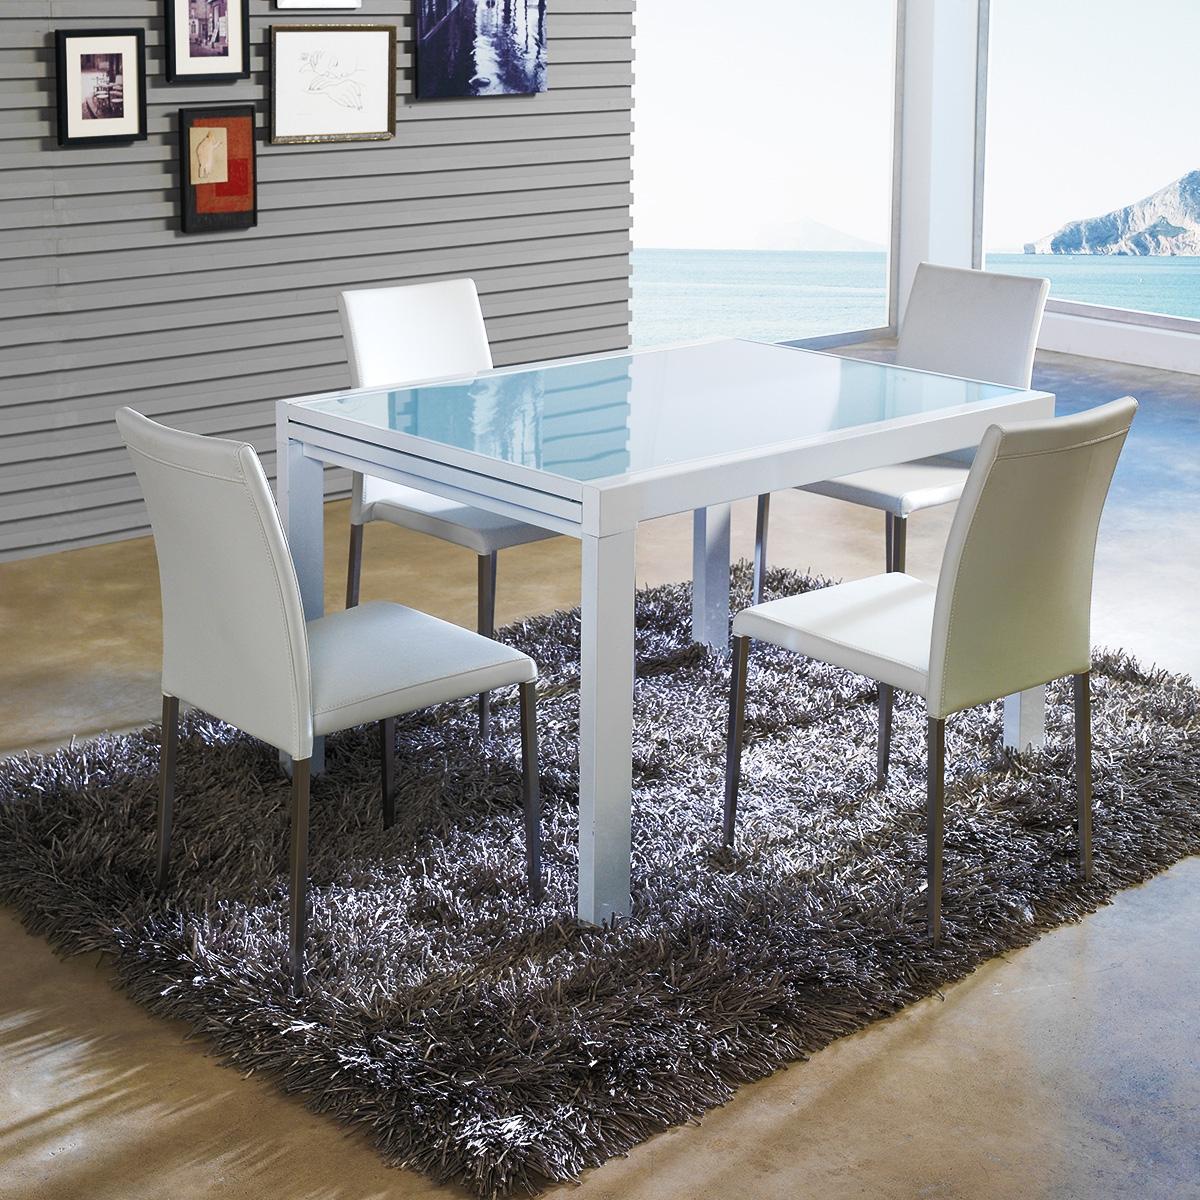 Table A Manger Avec Rallonge - Zendart Design intérieur Table A Manger Design